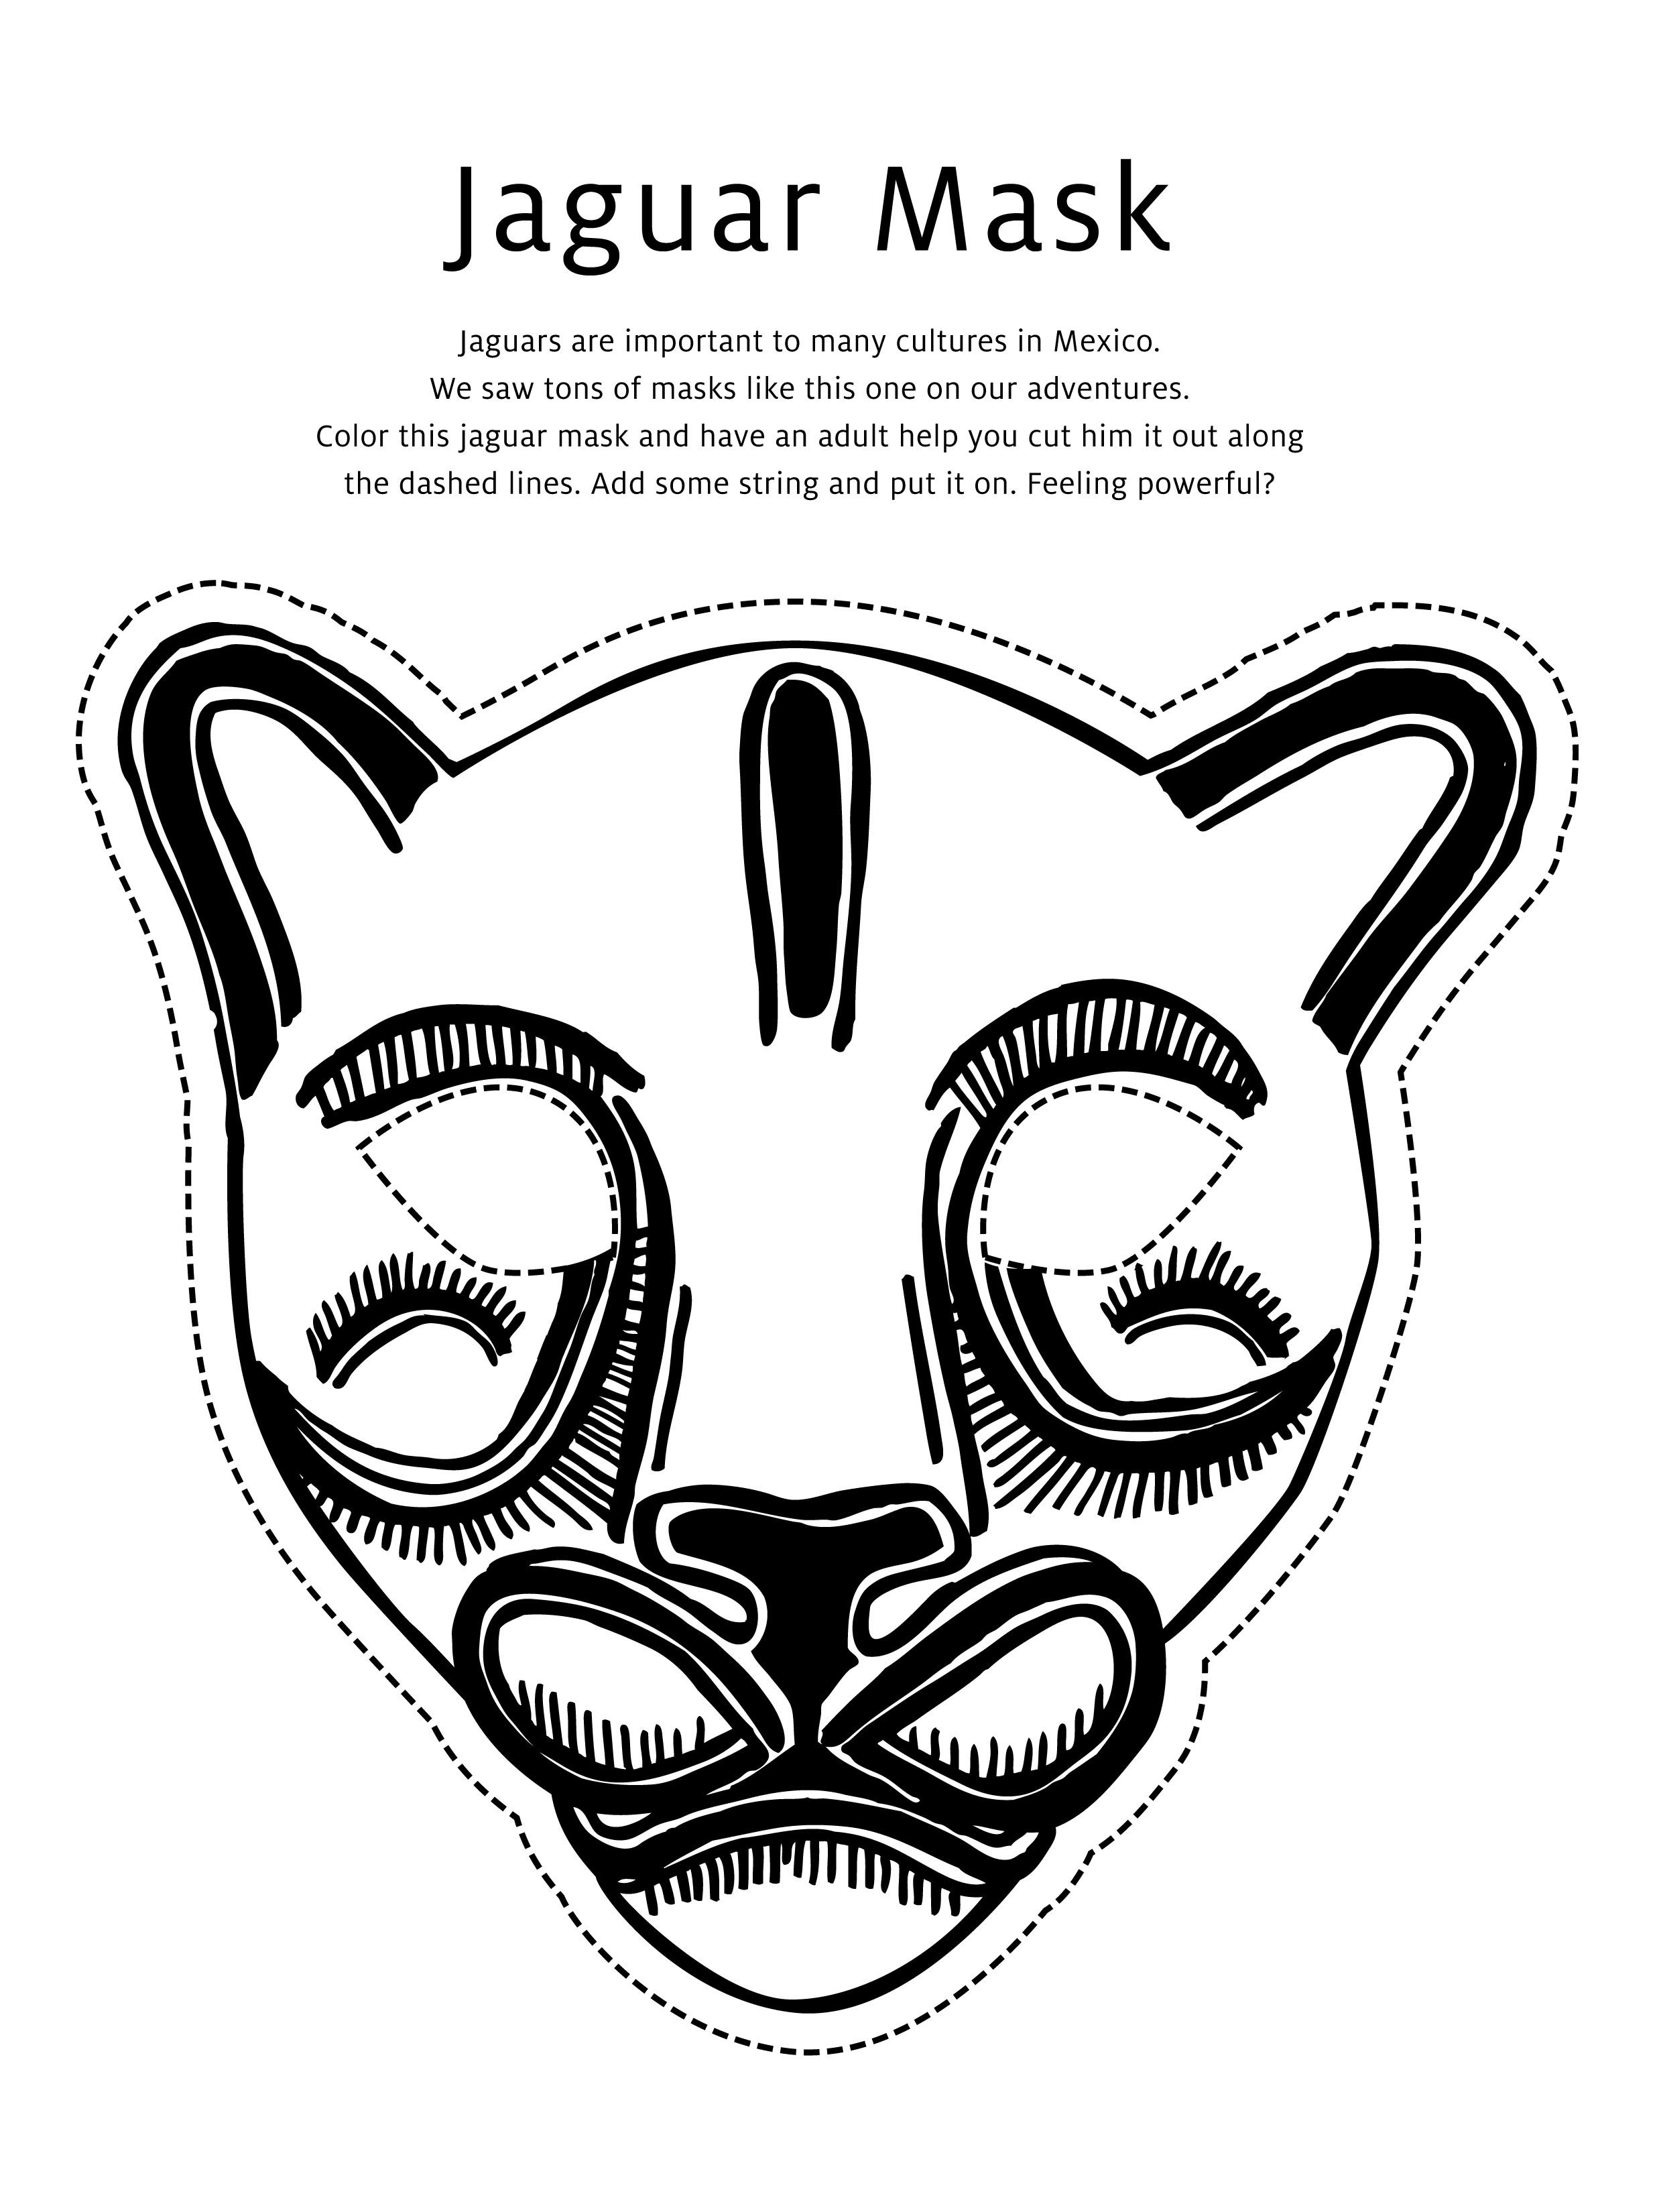 jaguar-mask-coloring-page.jpg 2,469×3,300 pixels | School Crafts ...